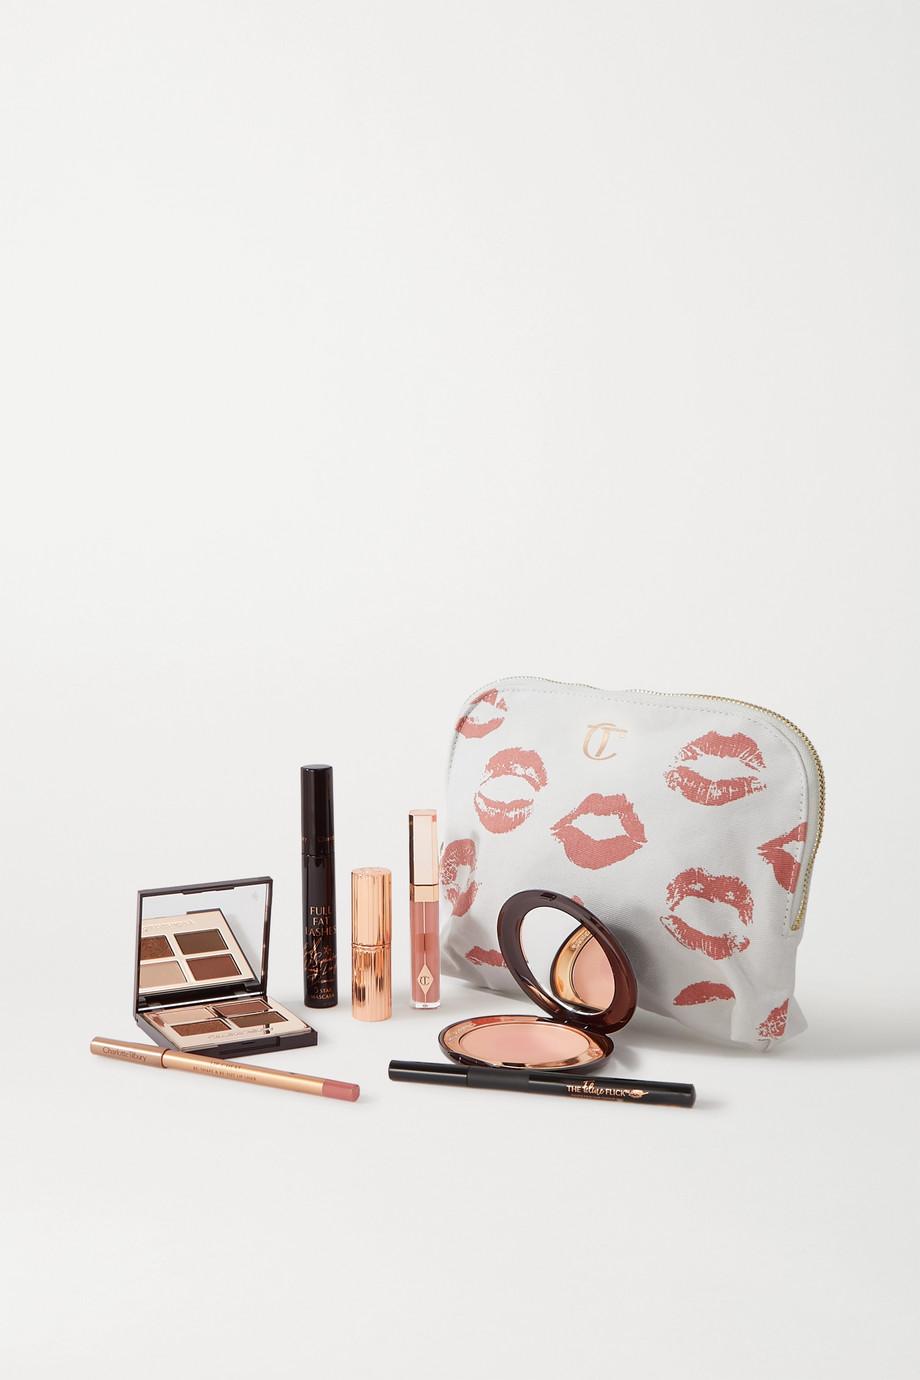 Charlotte Tilbury The Bella Sofia Makeup Look gift set